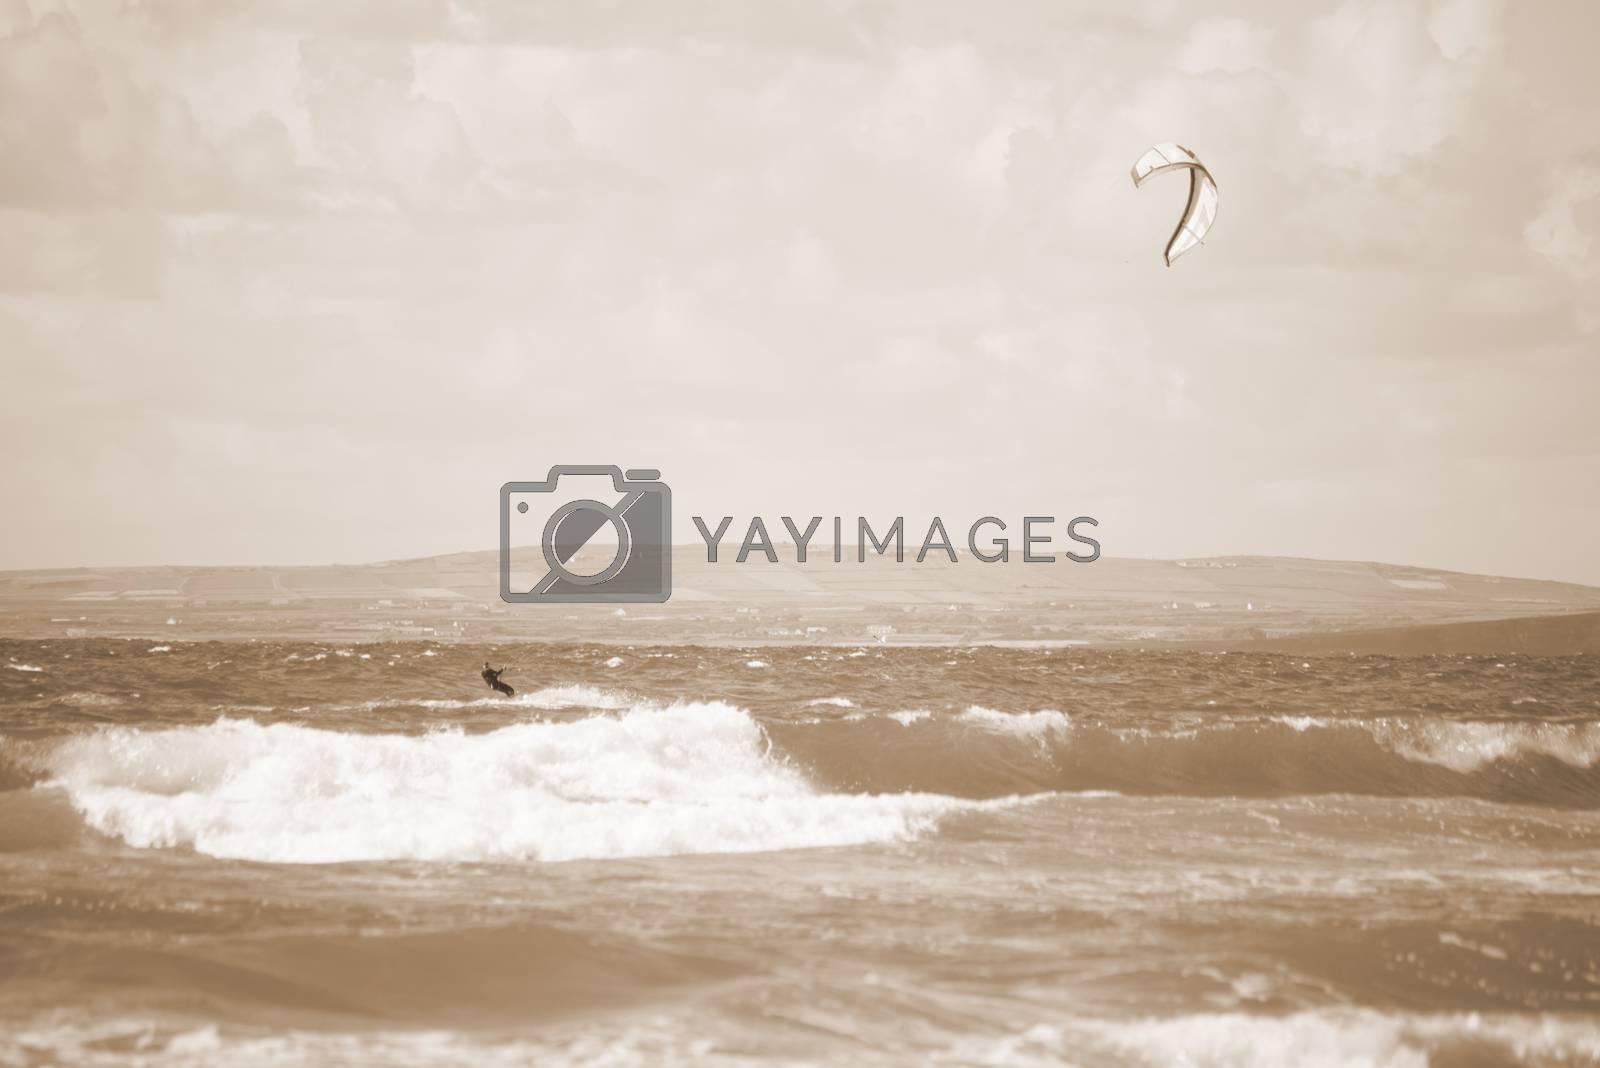 kite surfer on beautiful waves at beach in ballybunion county kerry ireland on the wild atlantic way